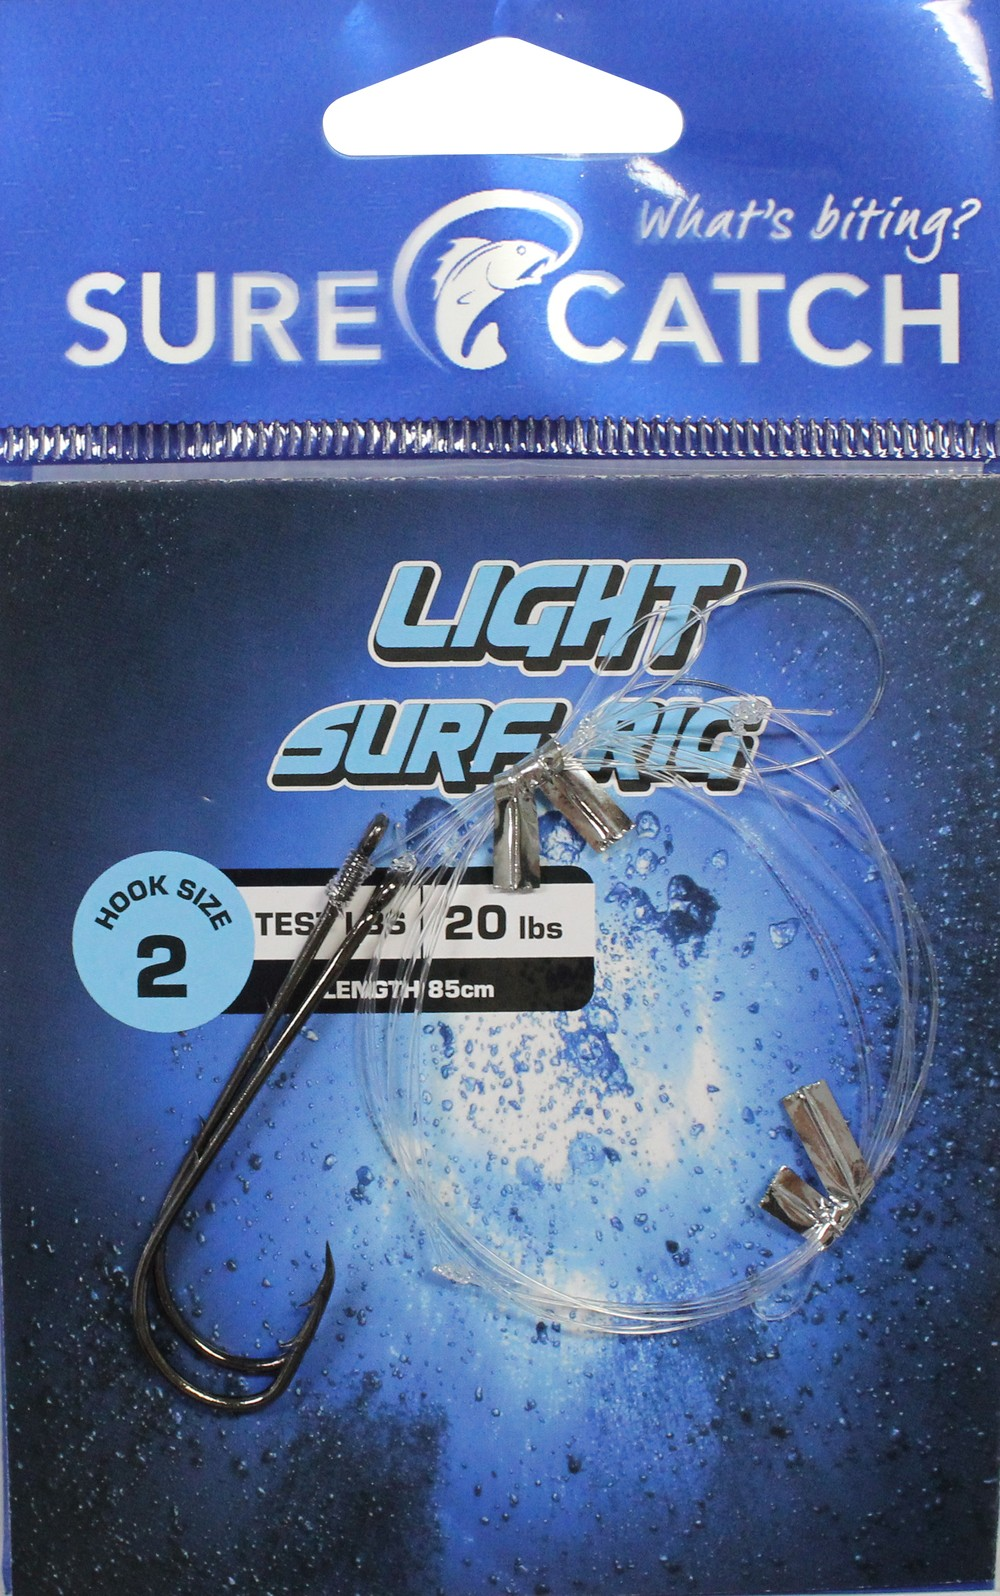 Sure Catch Light Surf Rig - Size 2